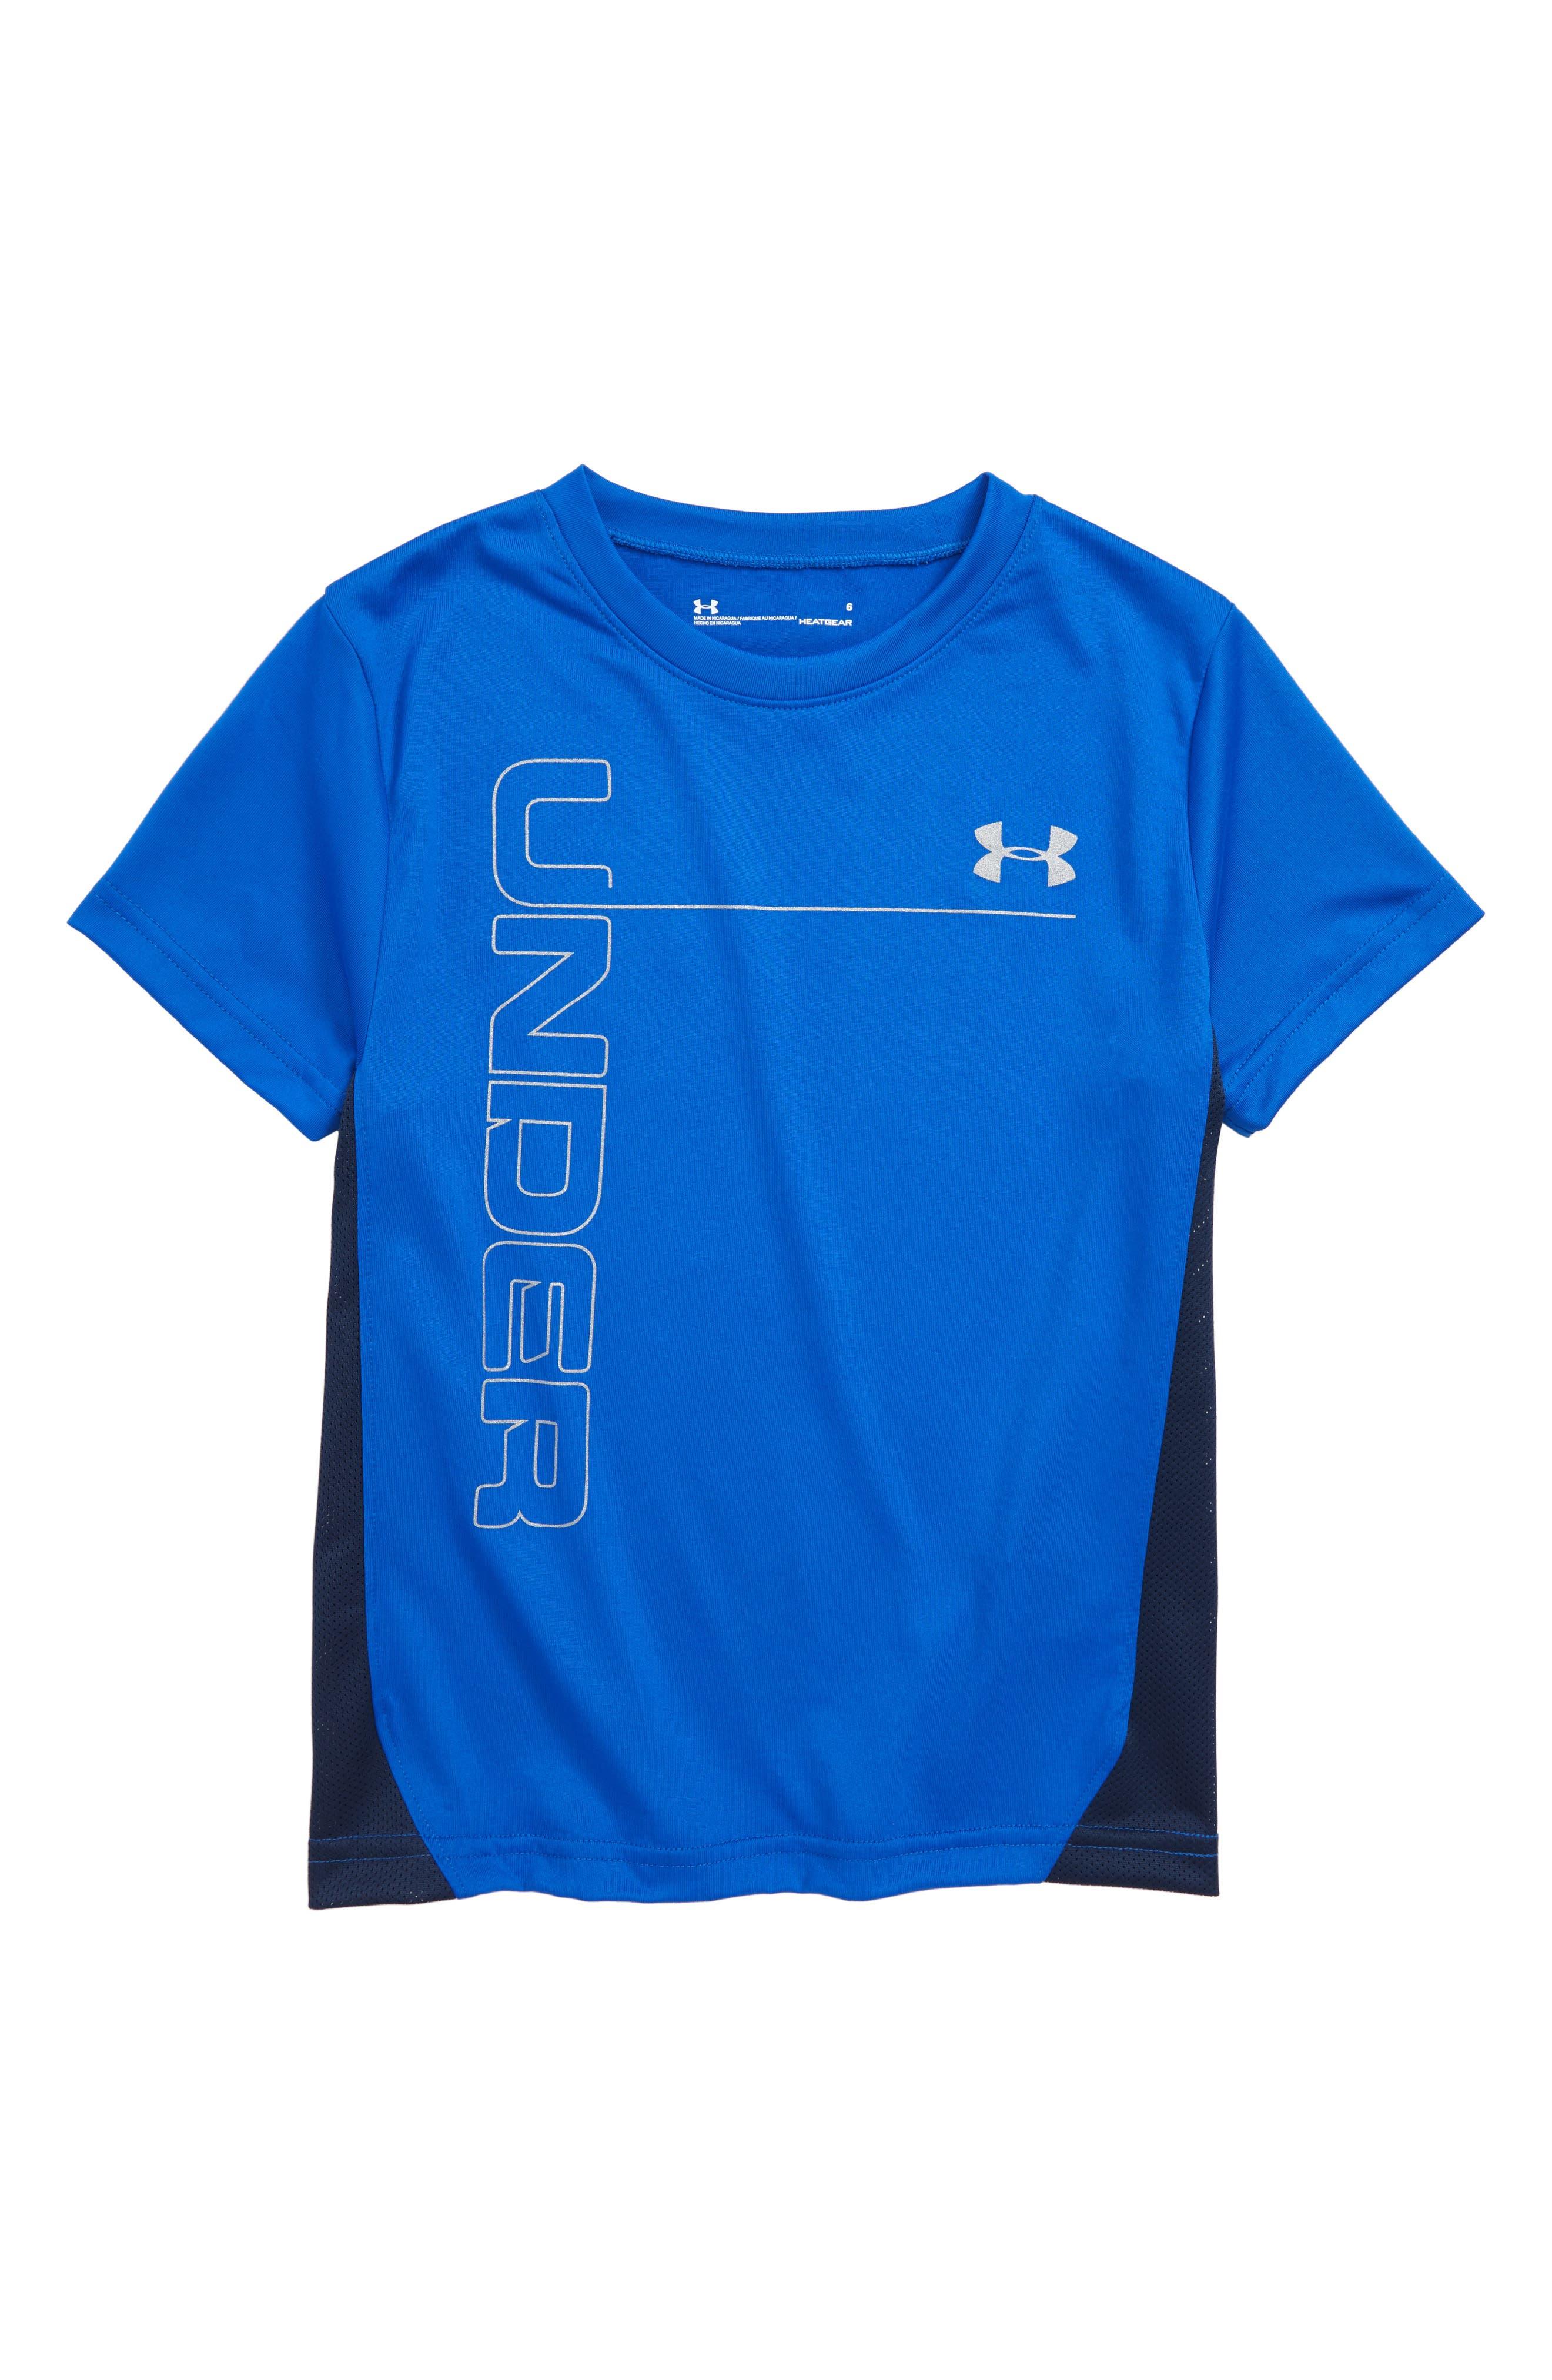 Mesh Tech HeatGear<sup>®</sup> T-Shirt,                         Main,                         color, 420